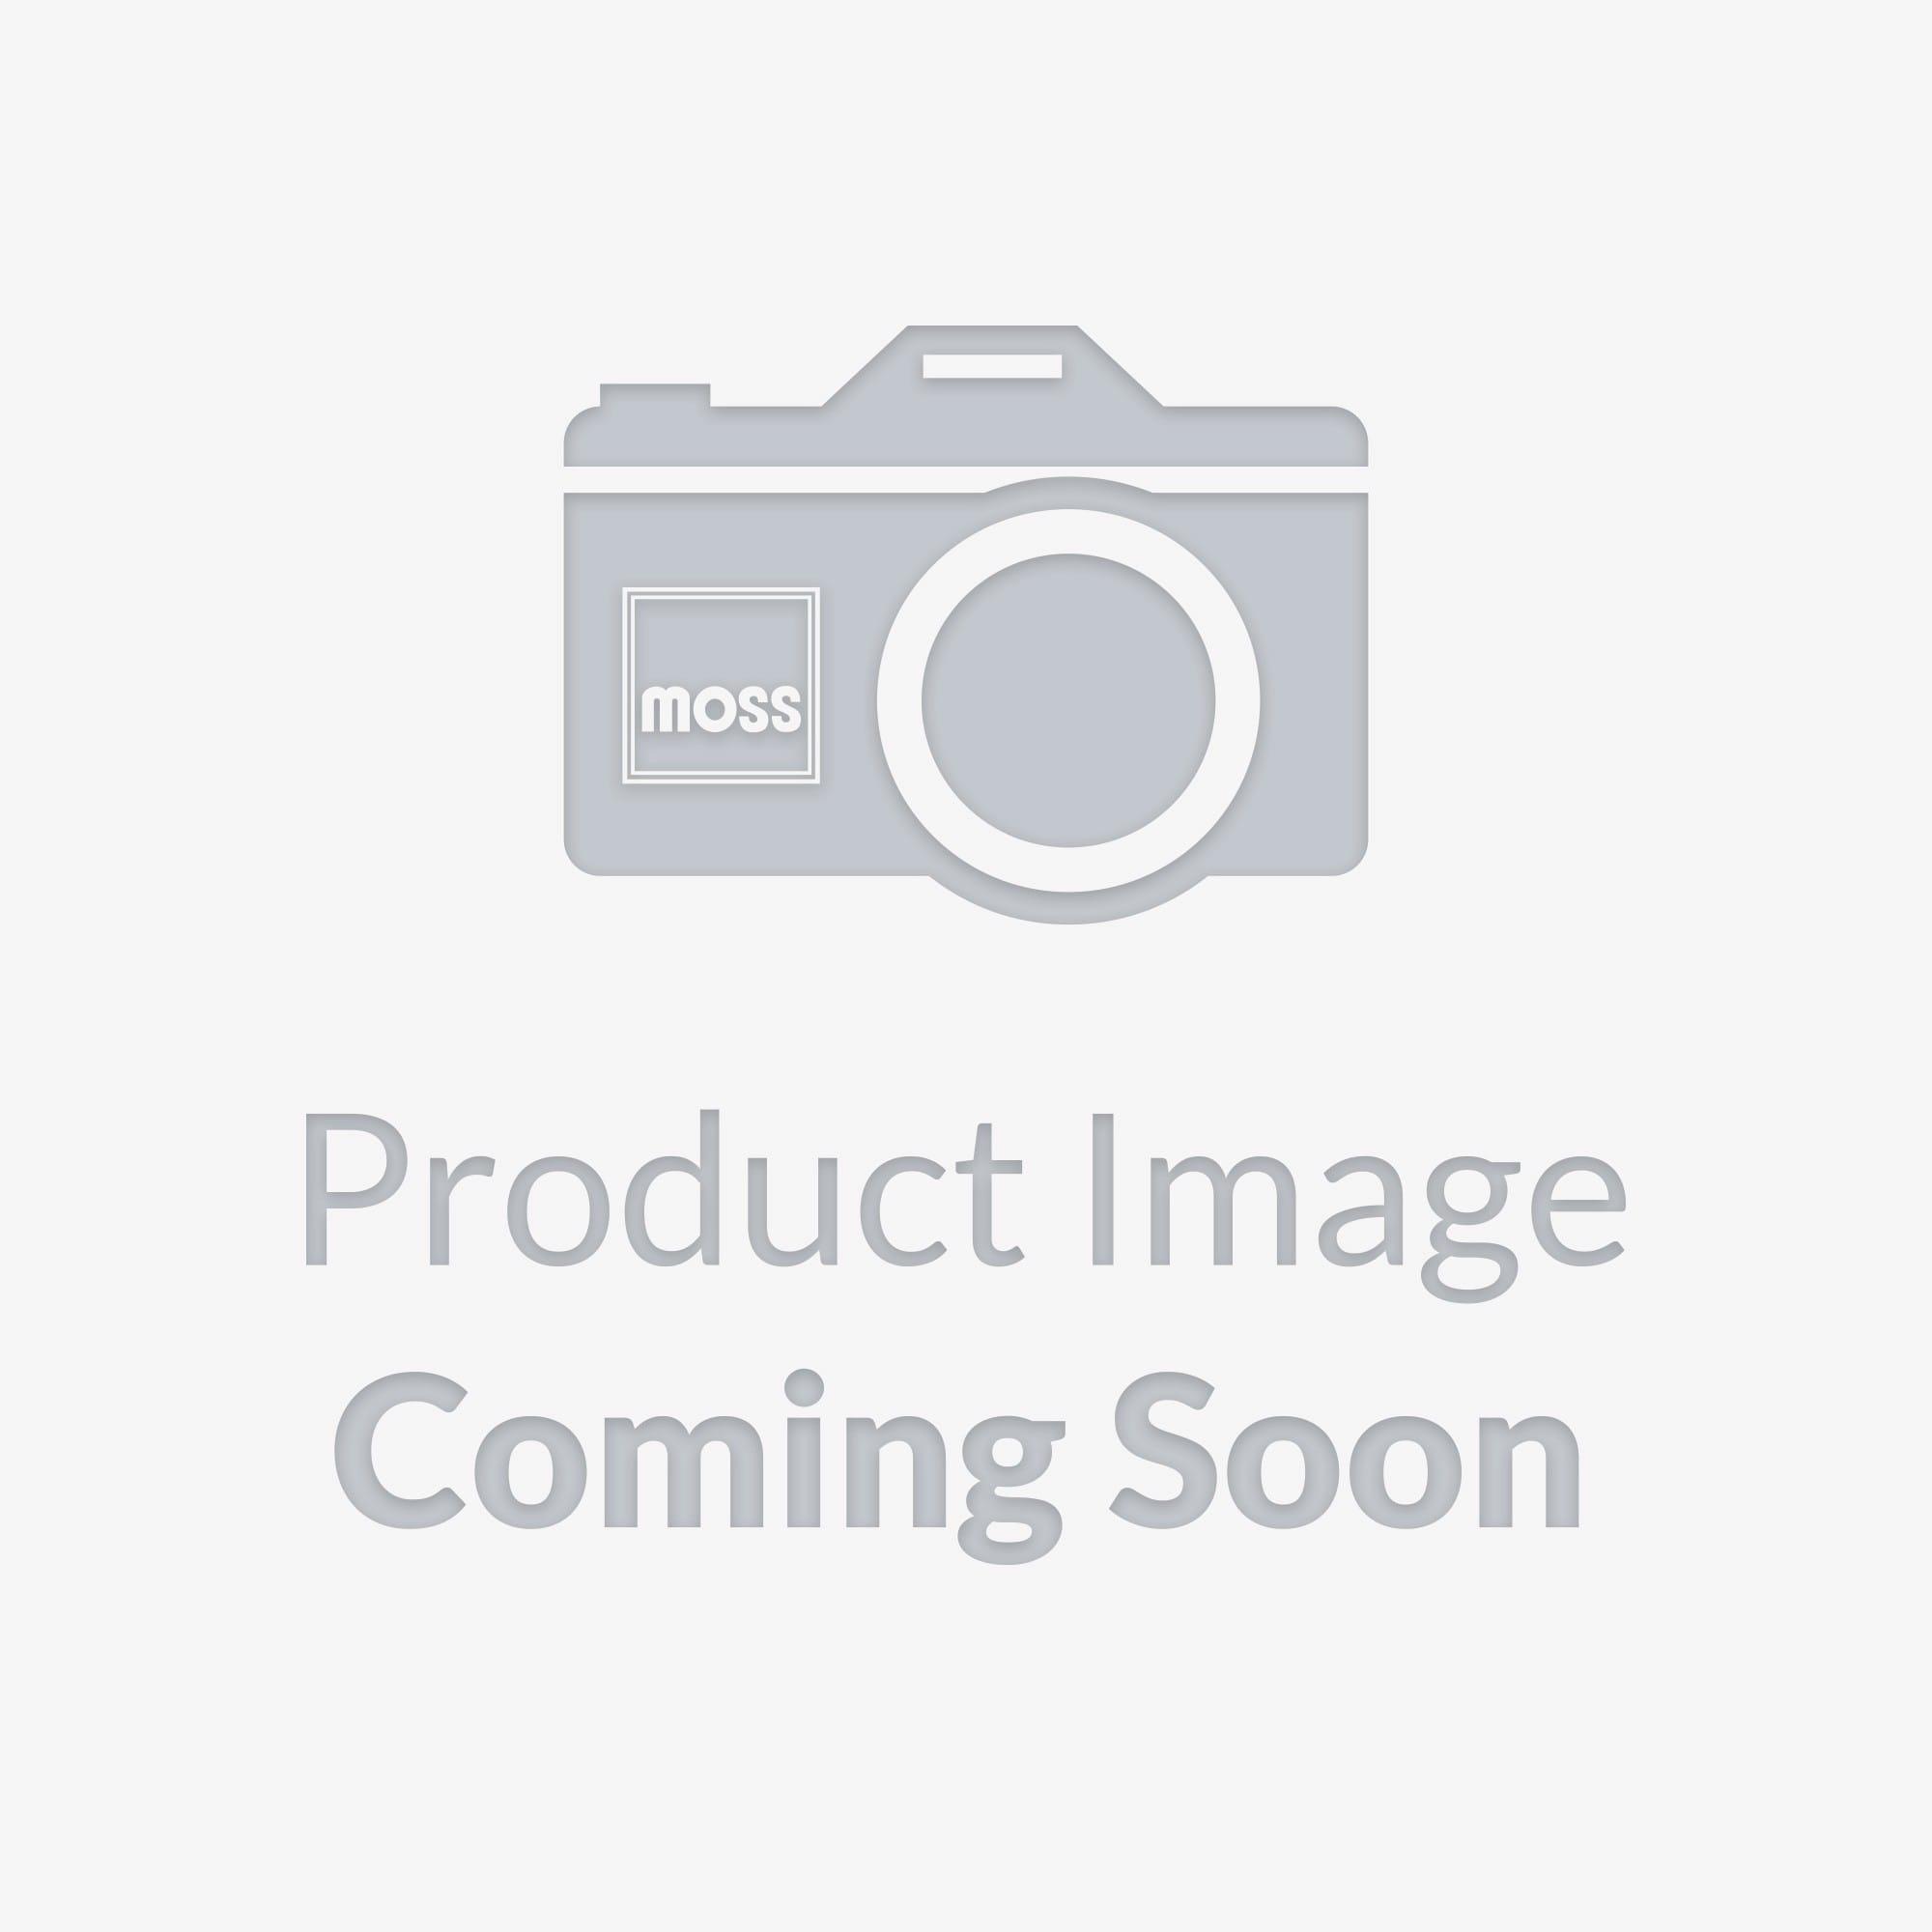 170 965 Ballast Resistor For Led Bulb Conversions Moss Motors Wiring Diagram Turn Signal